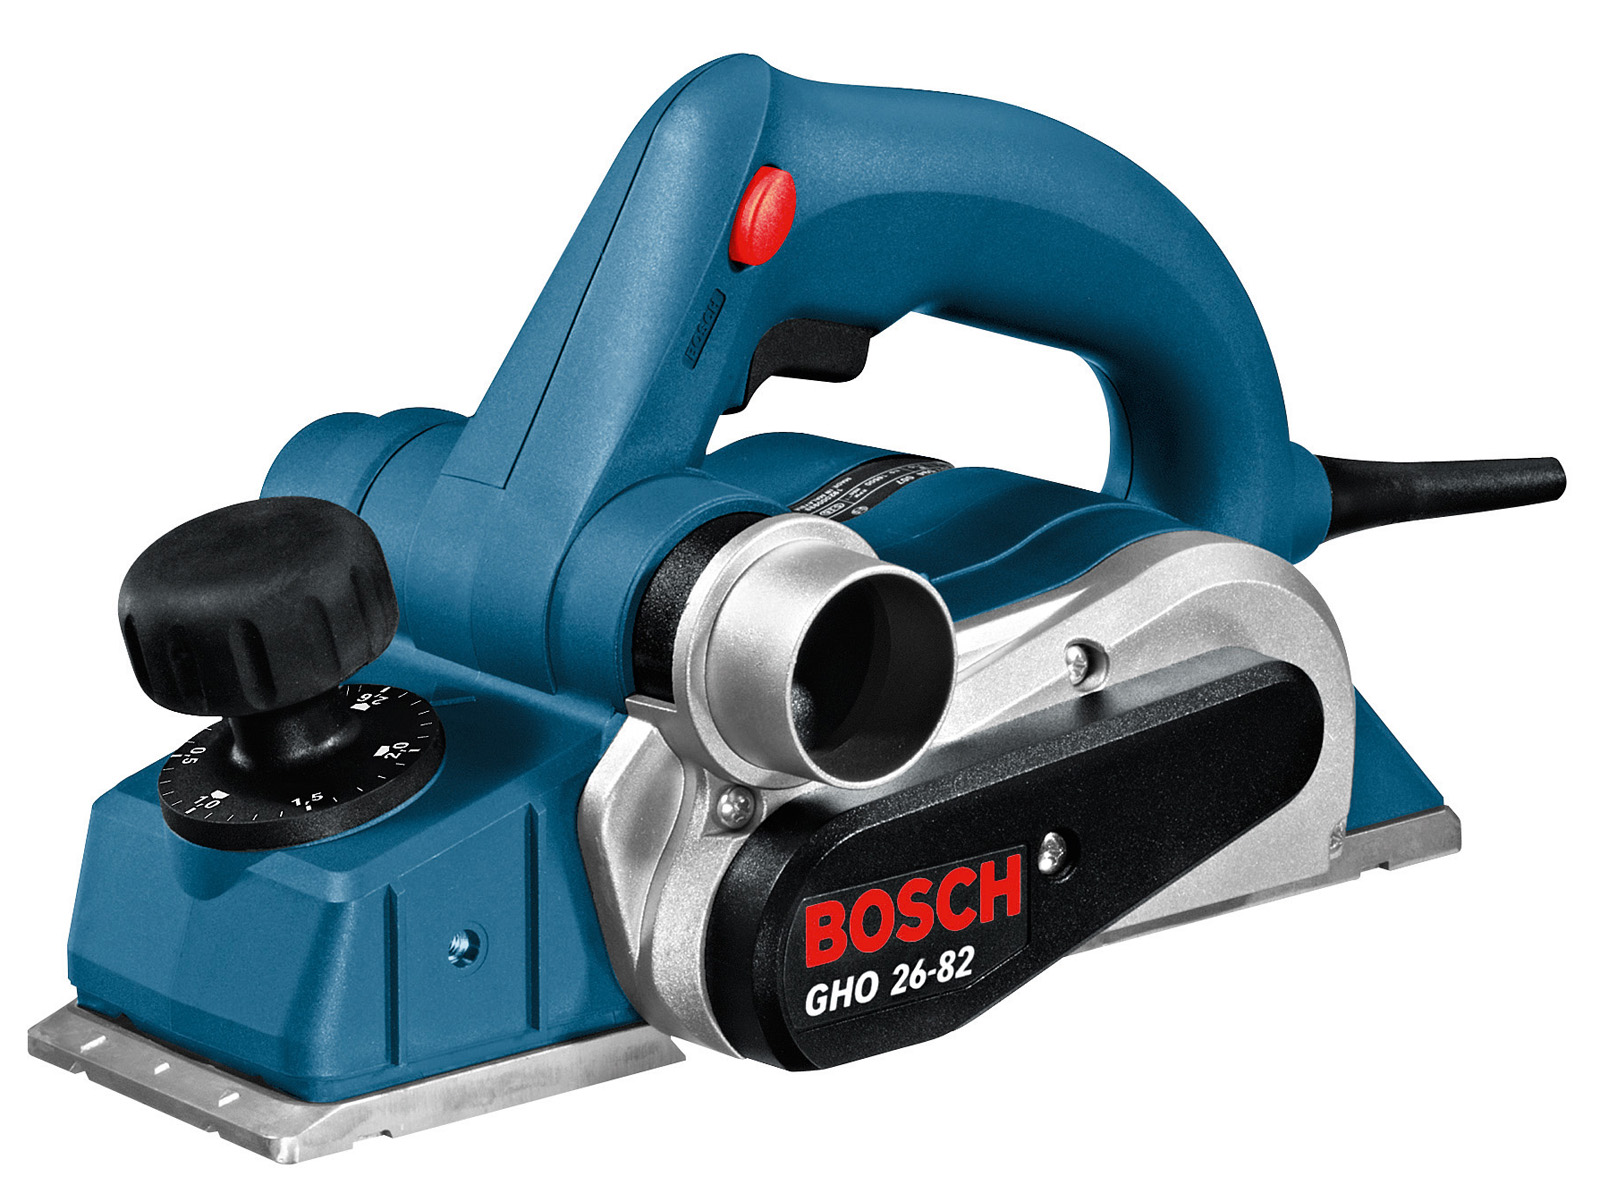 Рубанок Bosch Gho 26-82 (в кейсе)